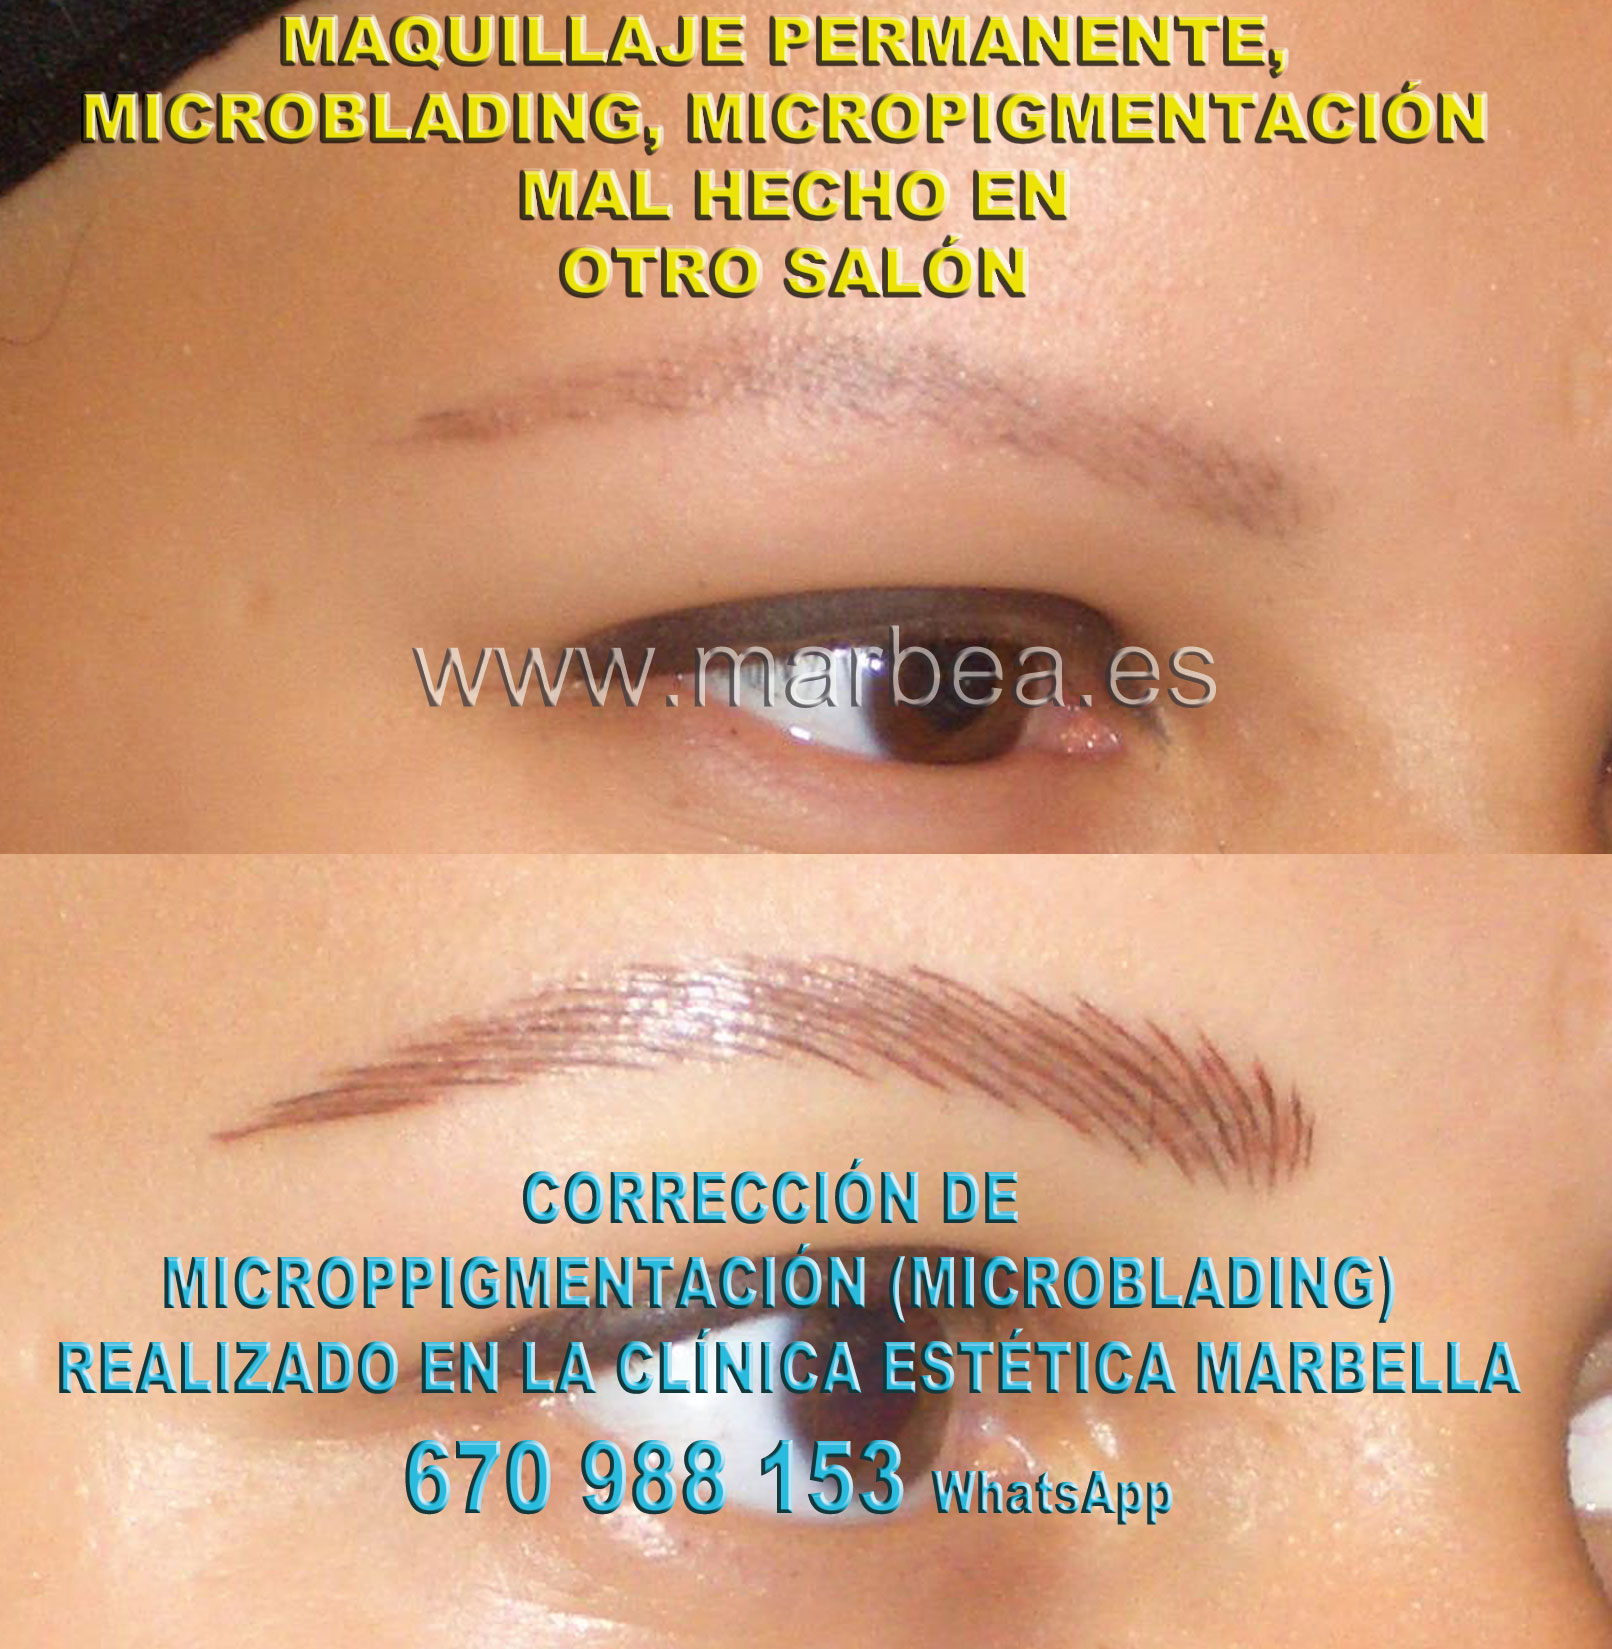 ELIMINAR TATUAJE CEJAS clínica estética micropigmentación entrega eliminar la micropigmentación de cejas,micropigmentación correctiva cejas mal hecha